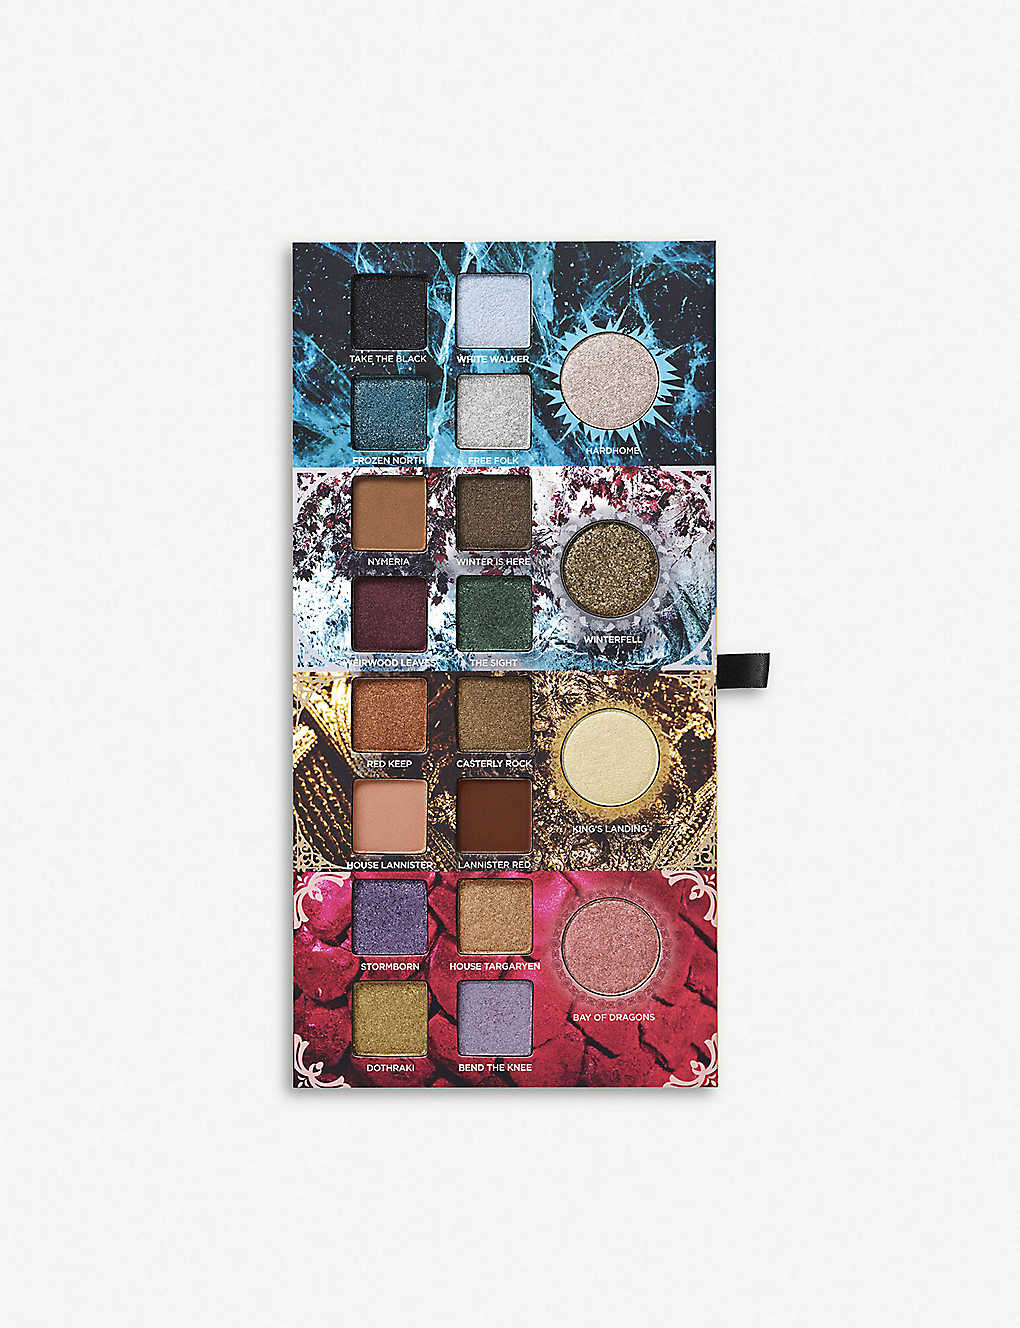 Game of Thrones eyeshadow palette ...